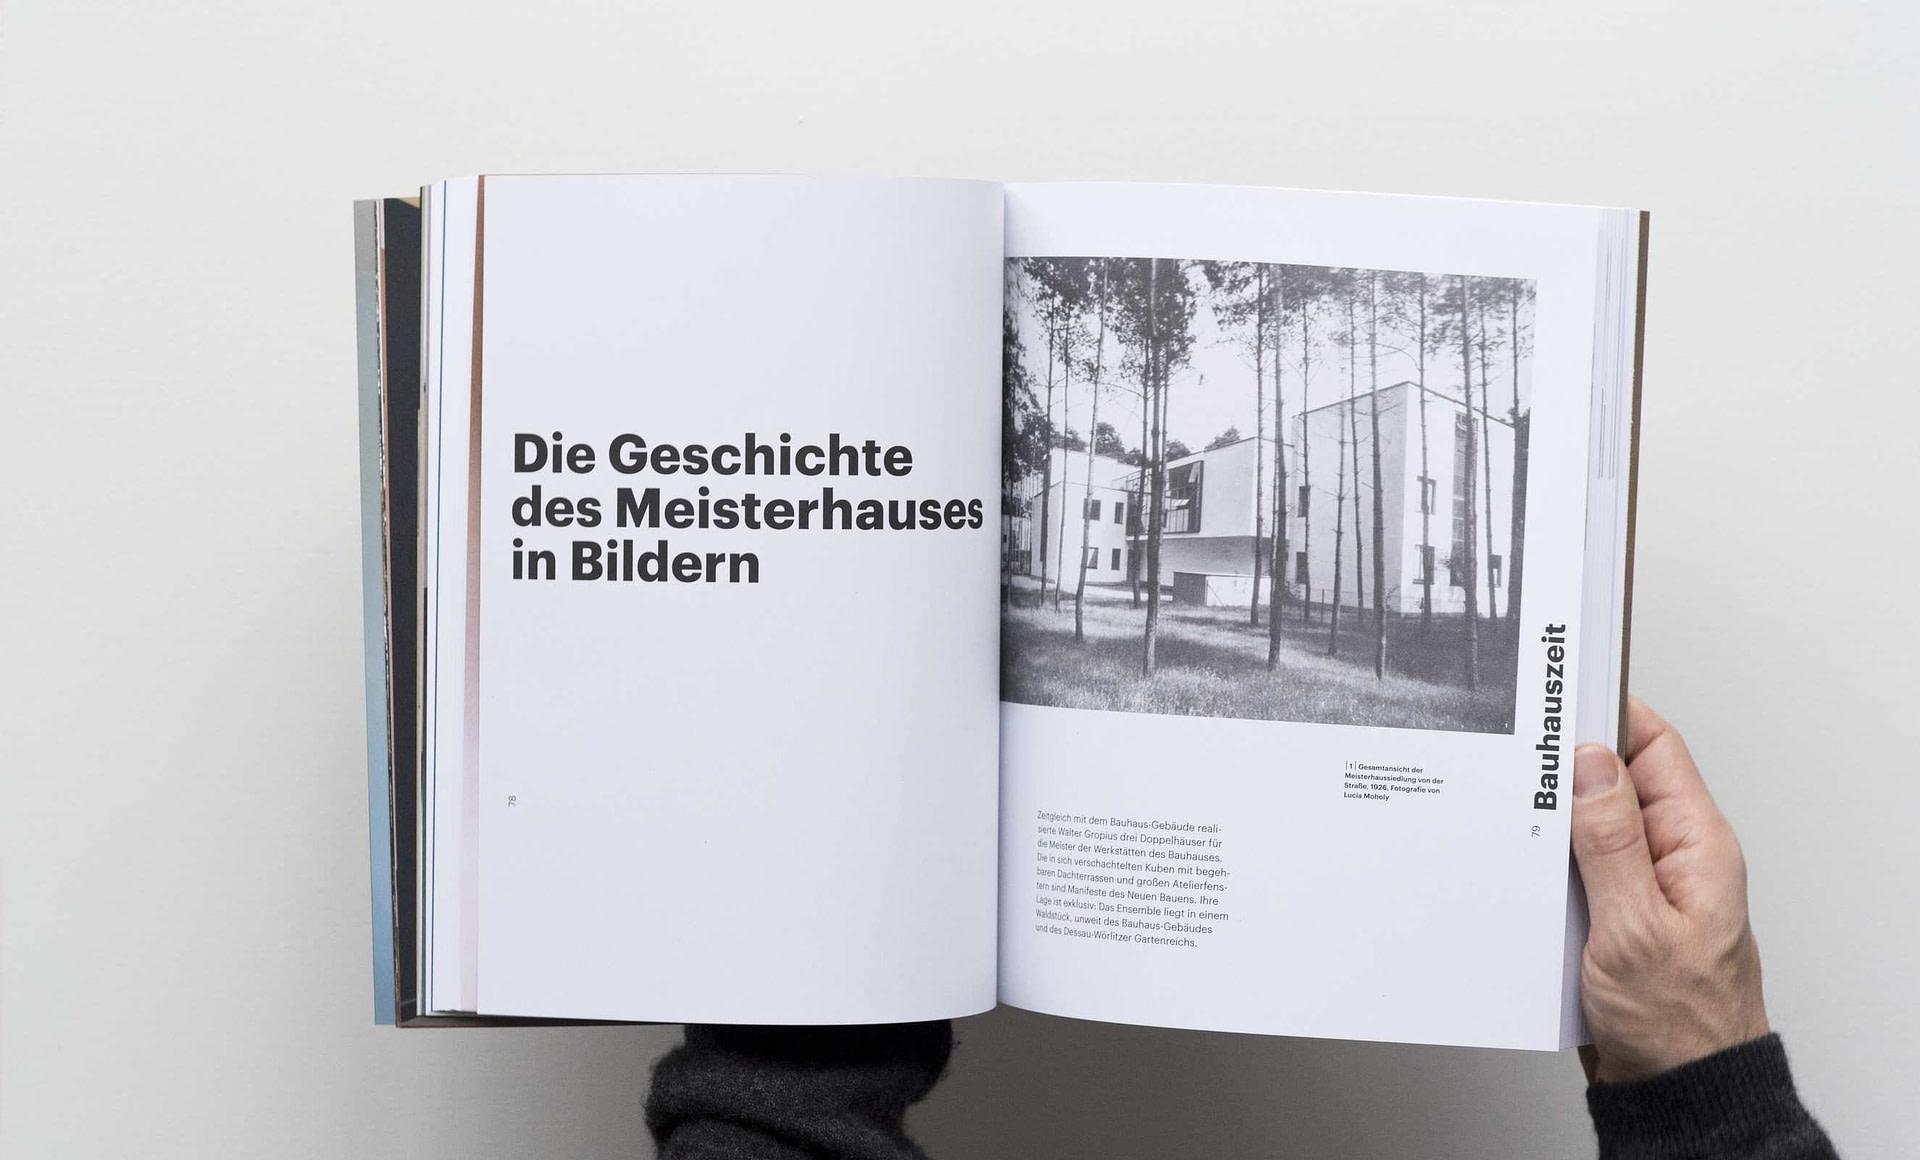 meisterhaus-kandinsky-klee-book-11-2650x1600px